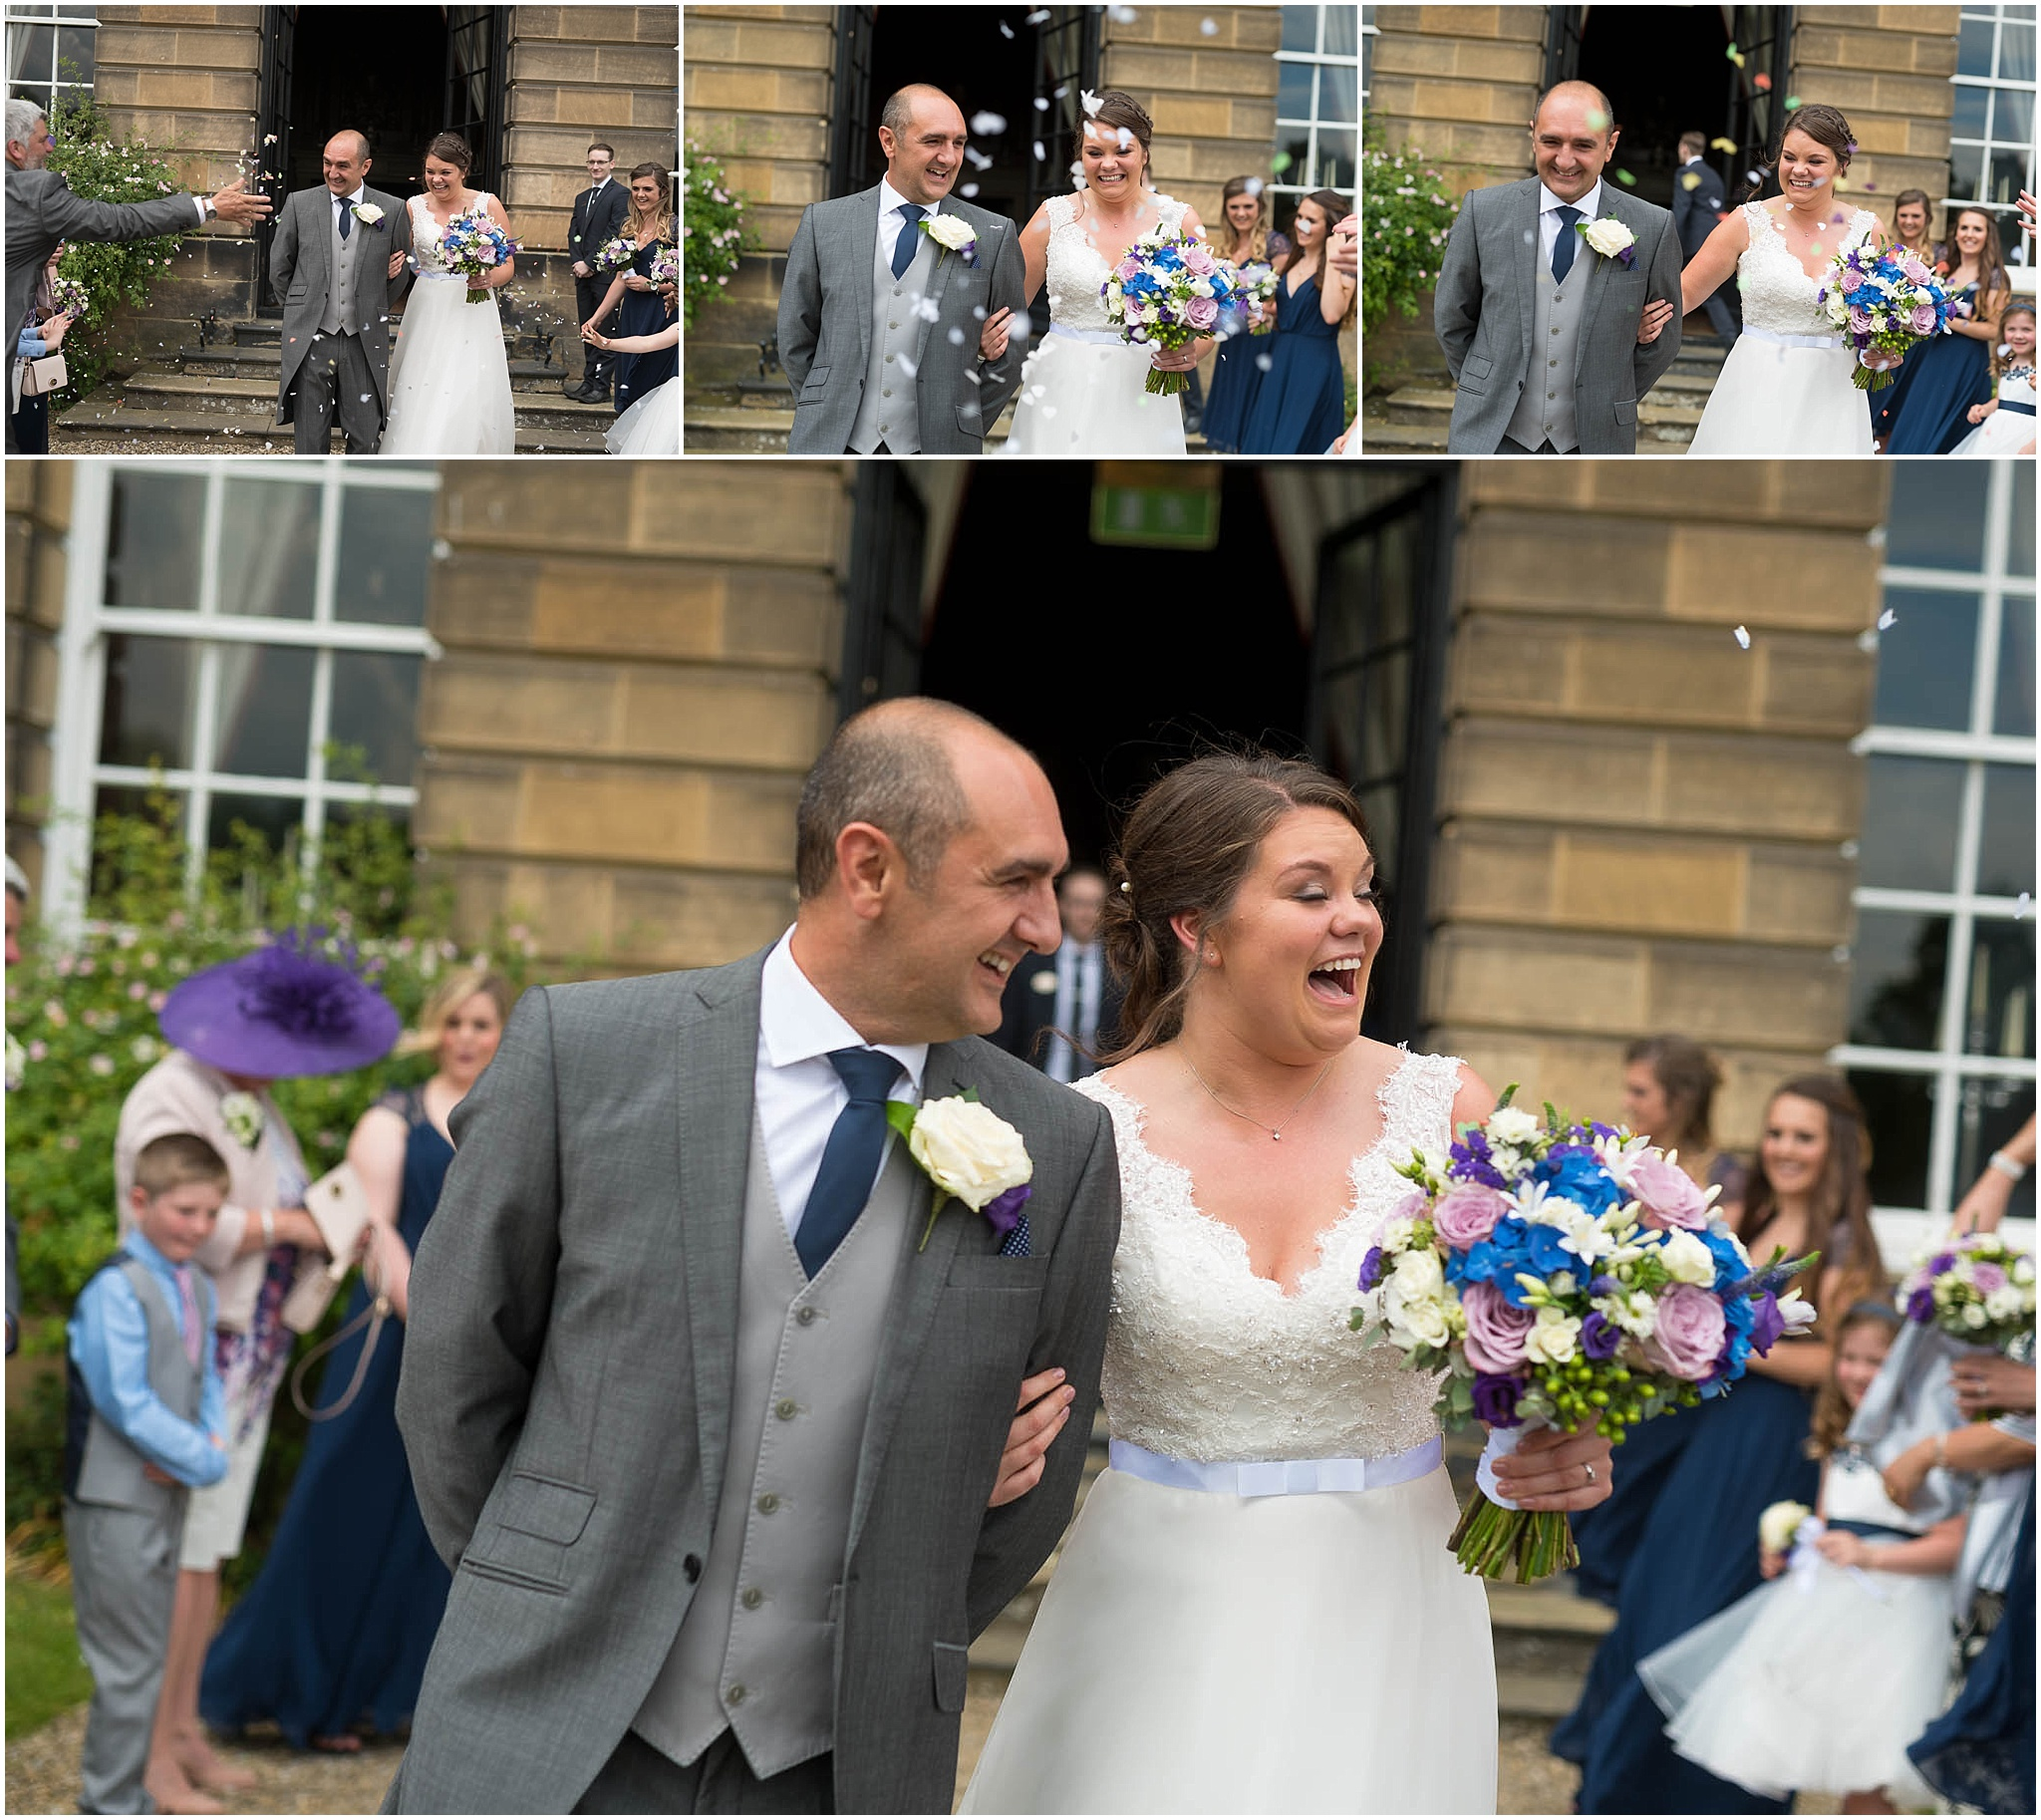 Crathorne Hall Hotel Wedding Photographer107.jpg